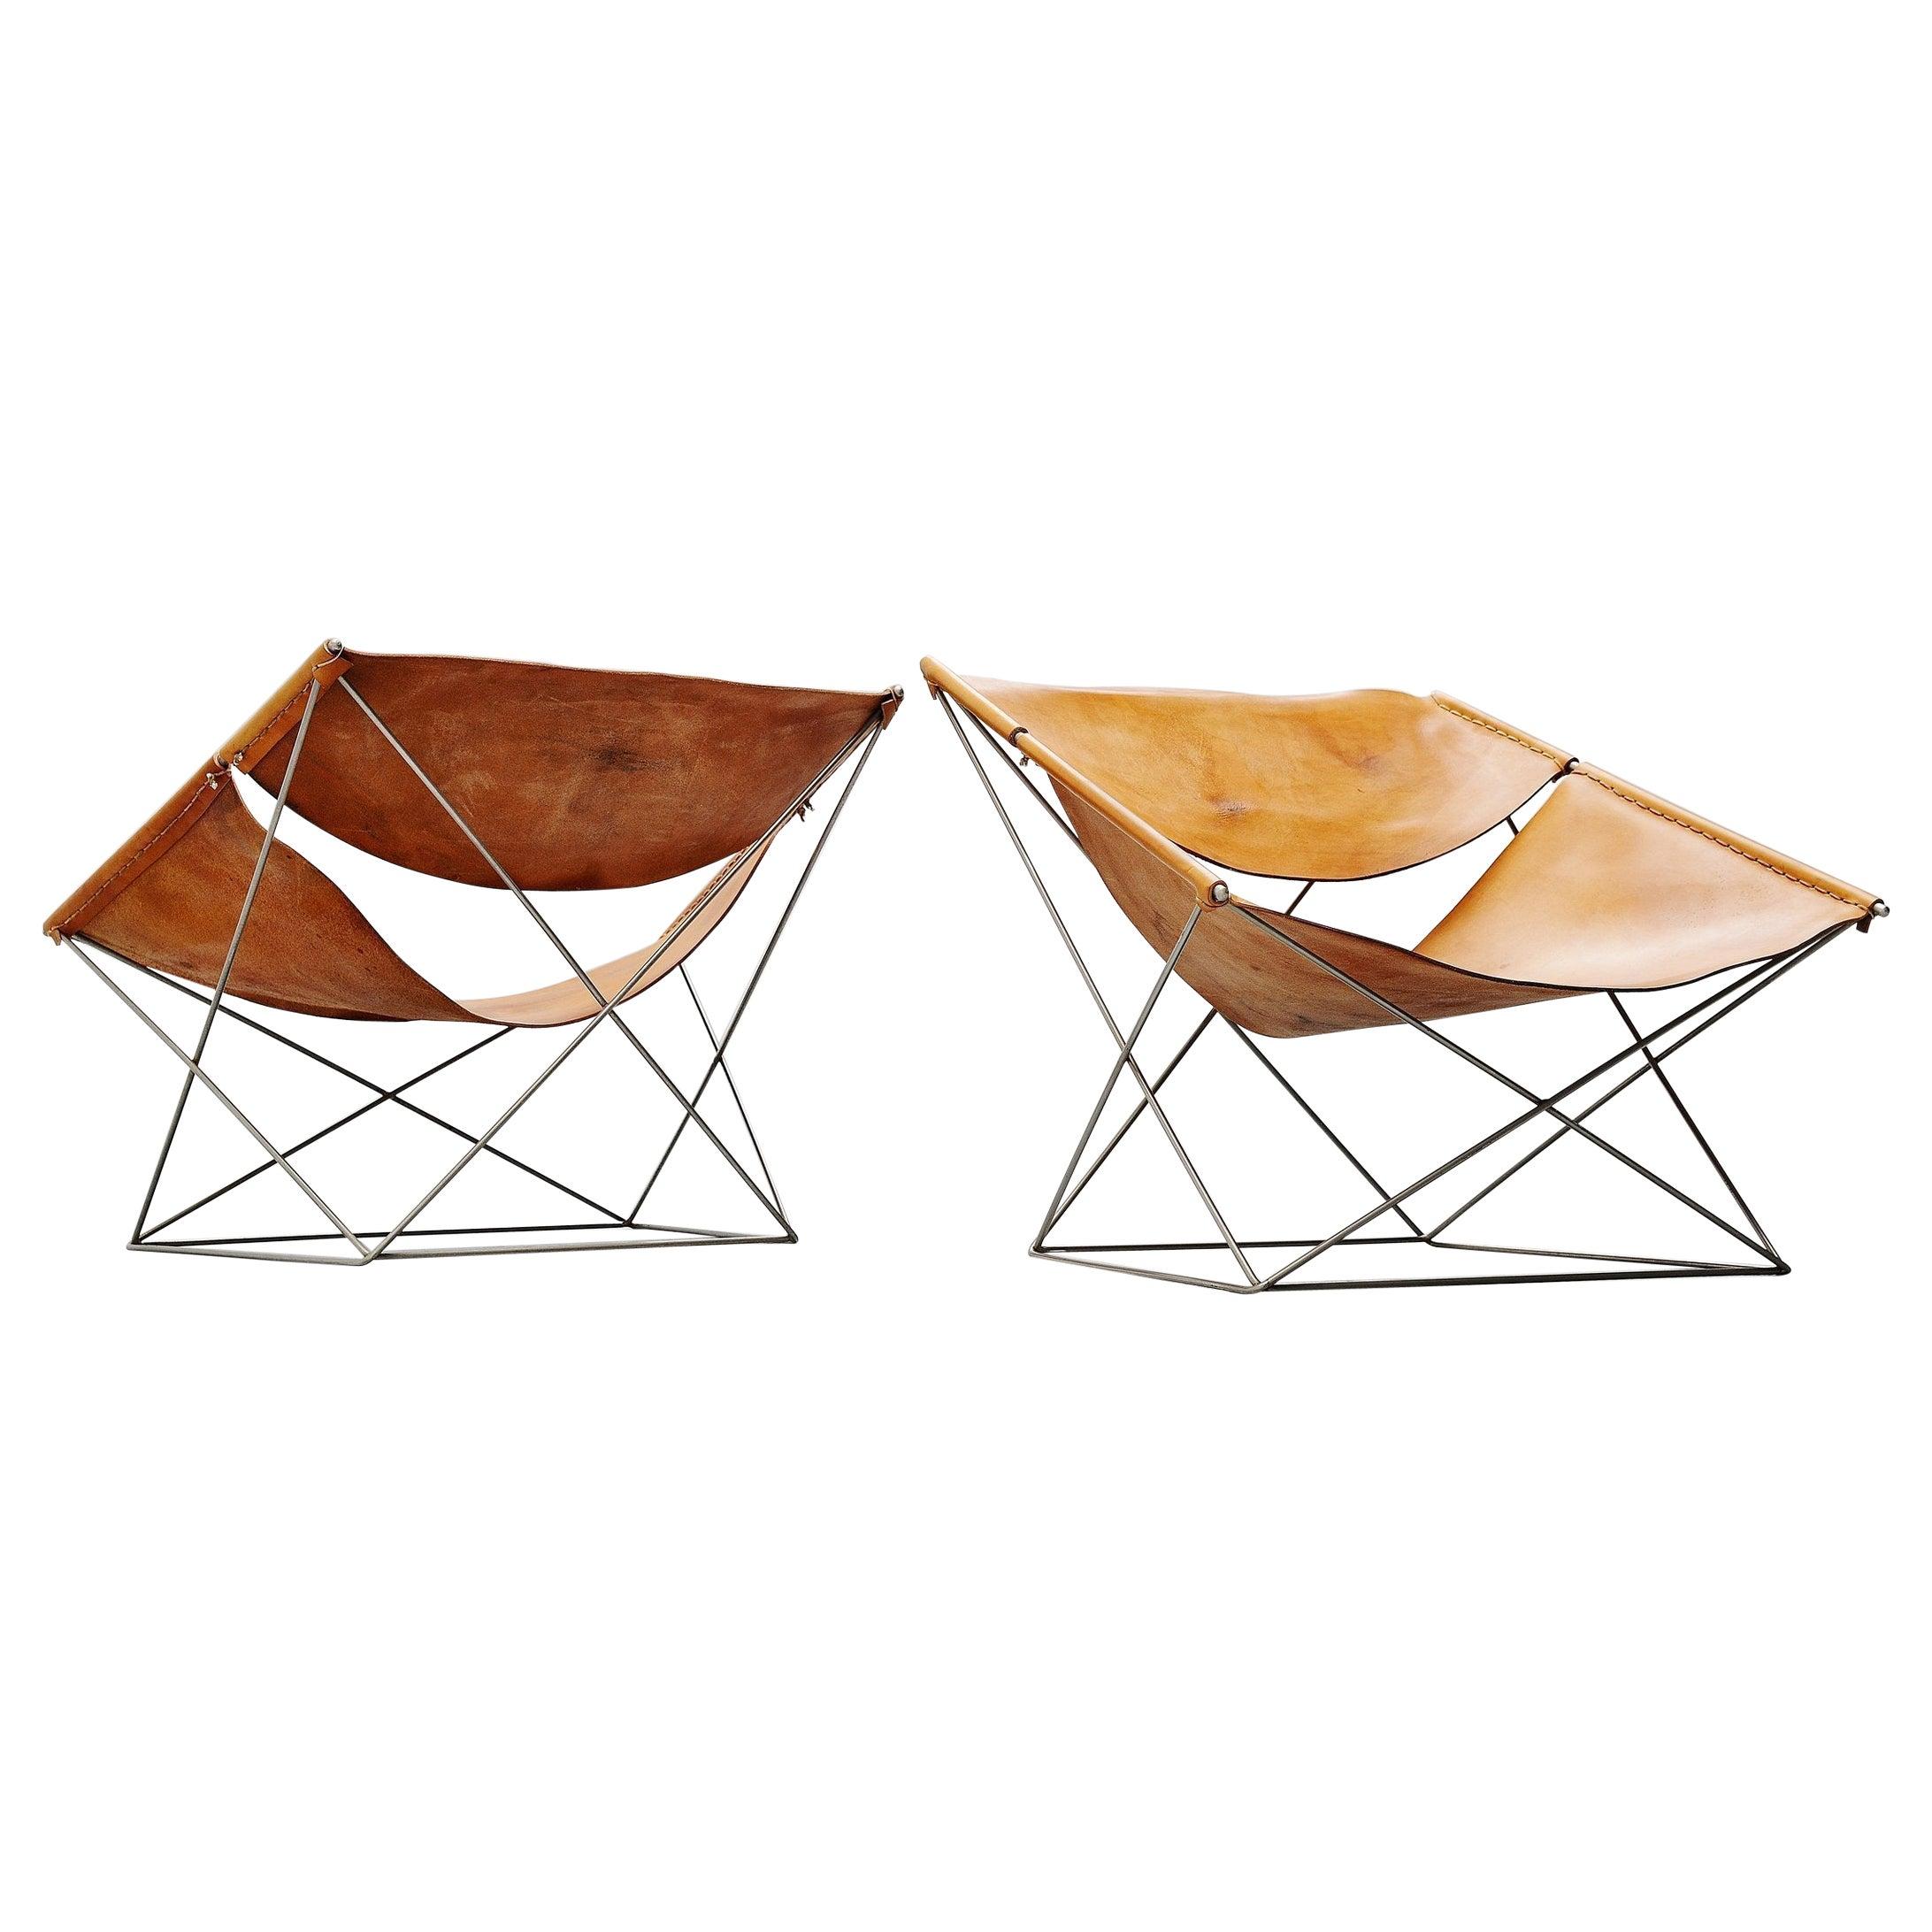 Pierre Paulin F675 Butterfly Chair Pair Artifort, 1963